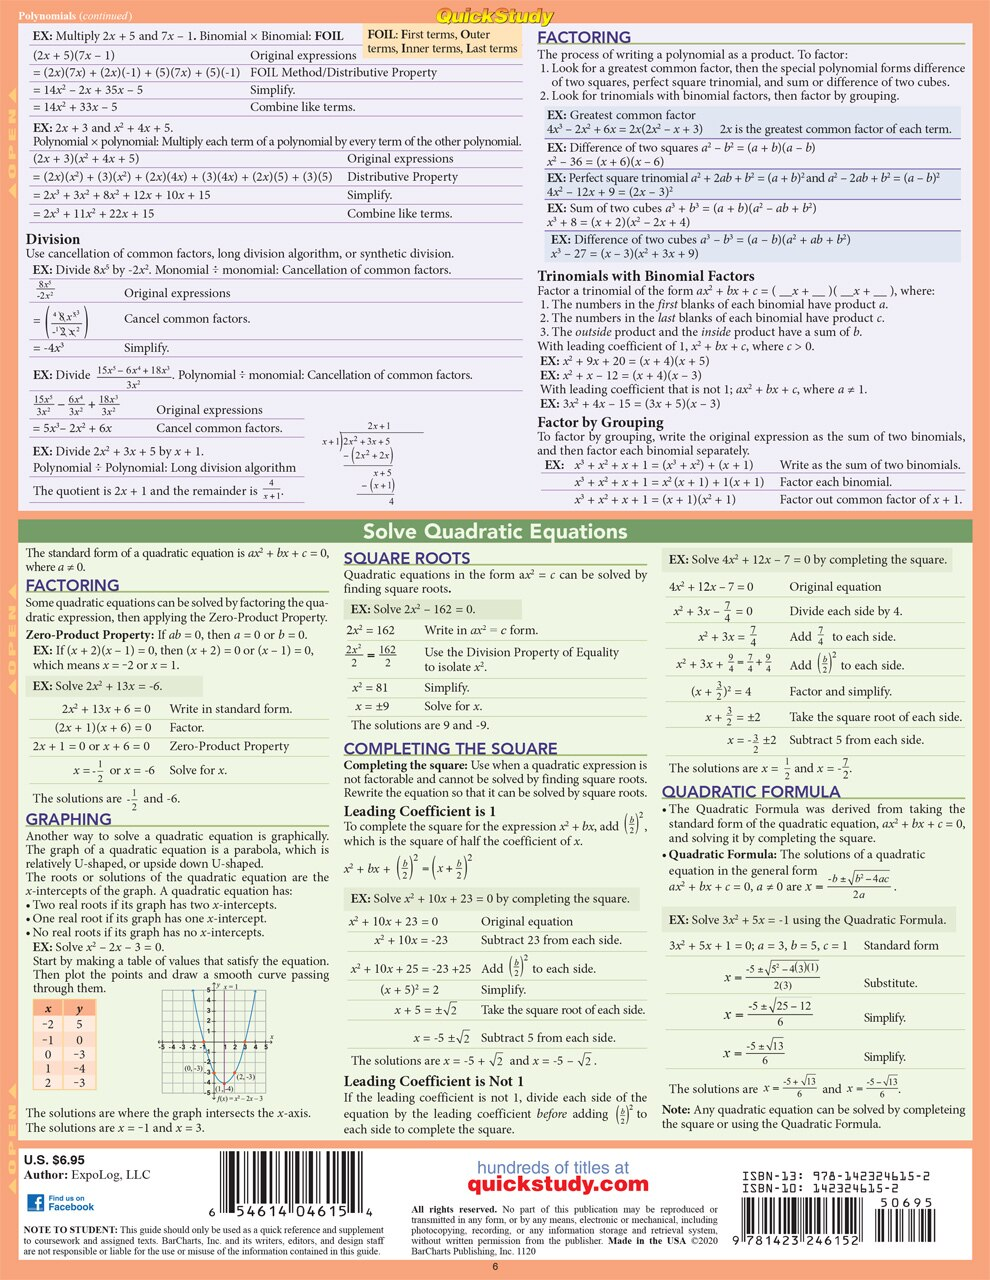 Quick Study QuickStudy Elementary Algebra Laminated Study Guide BarCharts Publishing Mathematic Reference Back Image